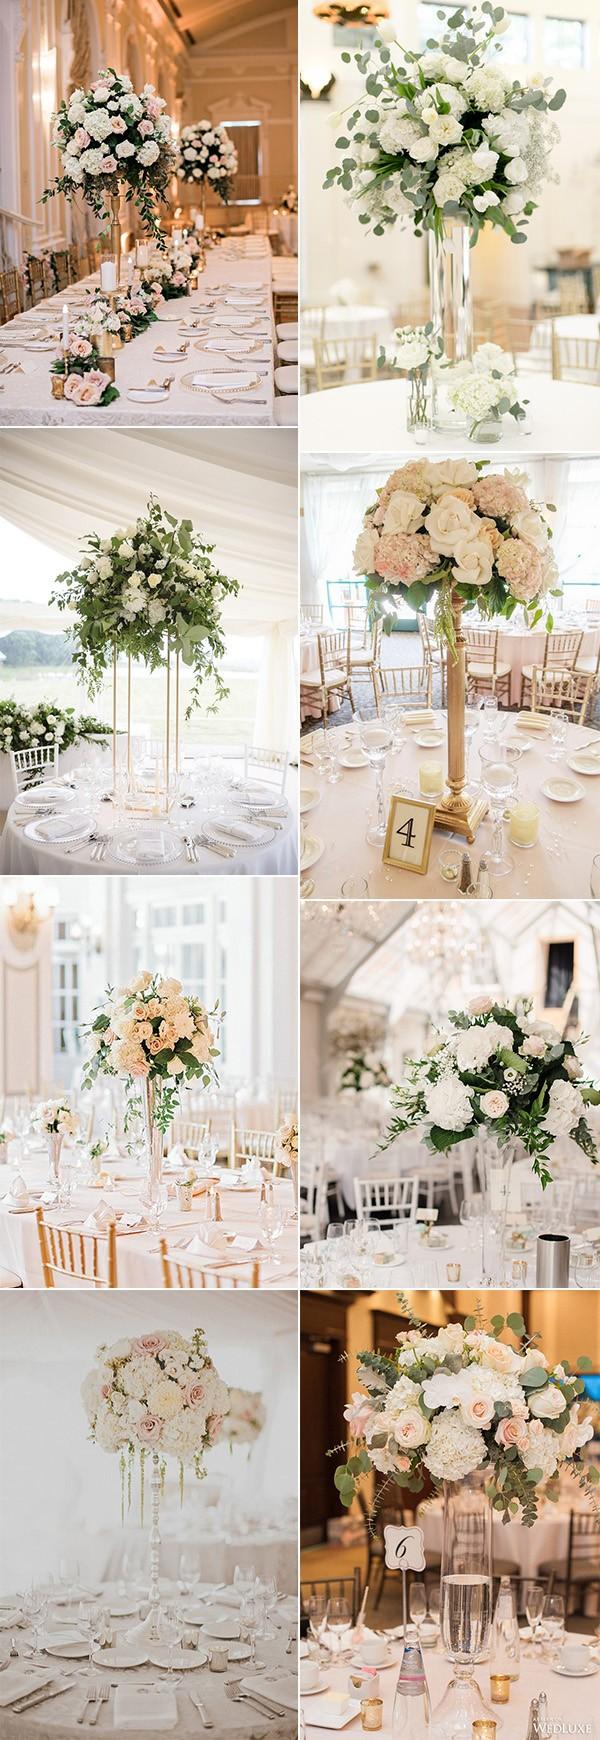 18 Stunning Tall Wedding Centerpiece Ideas - Page 2 of 3 ...